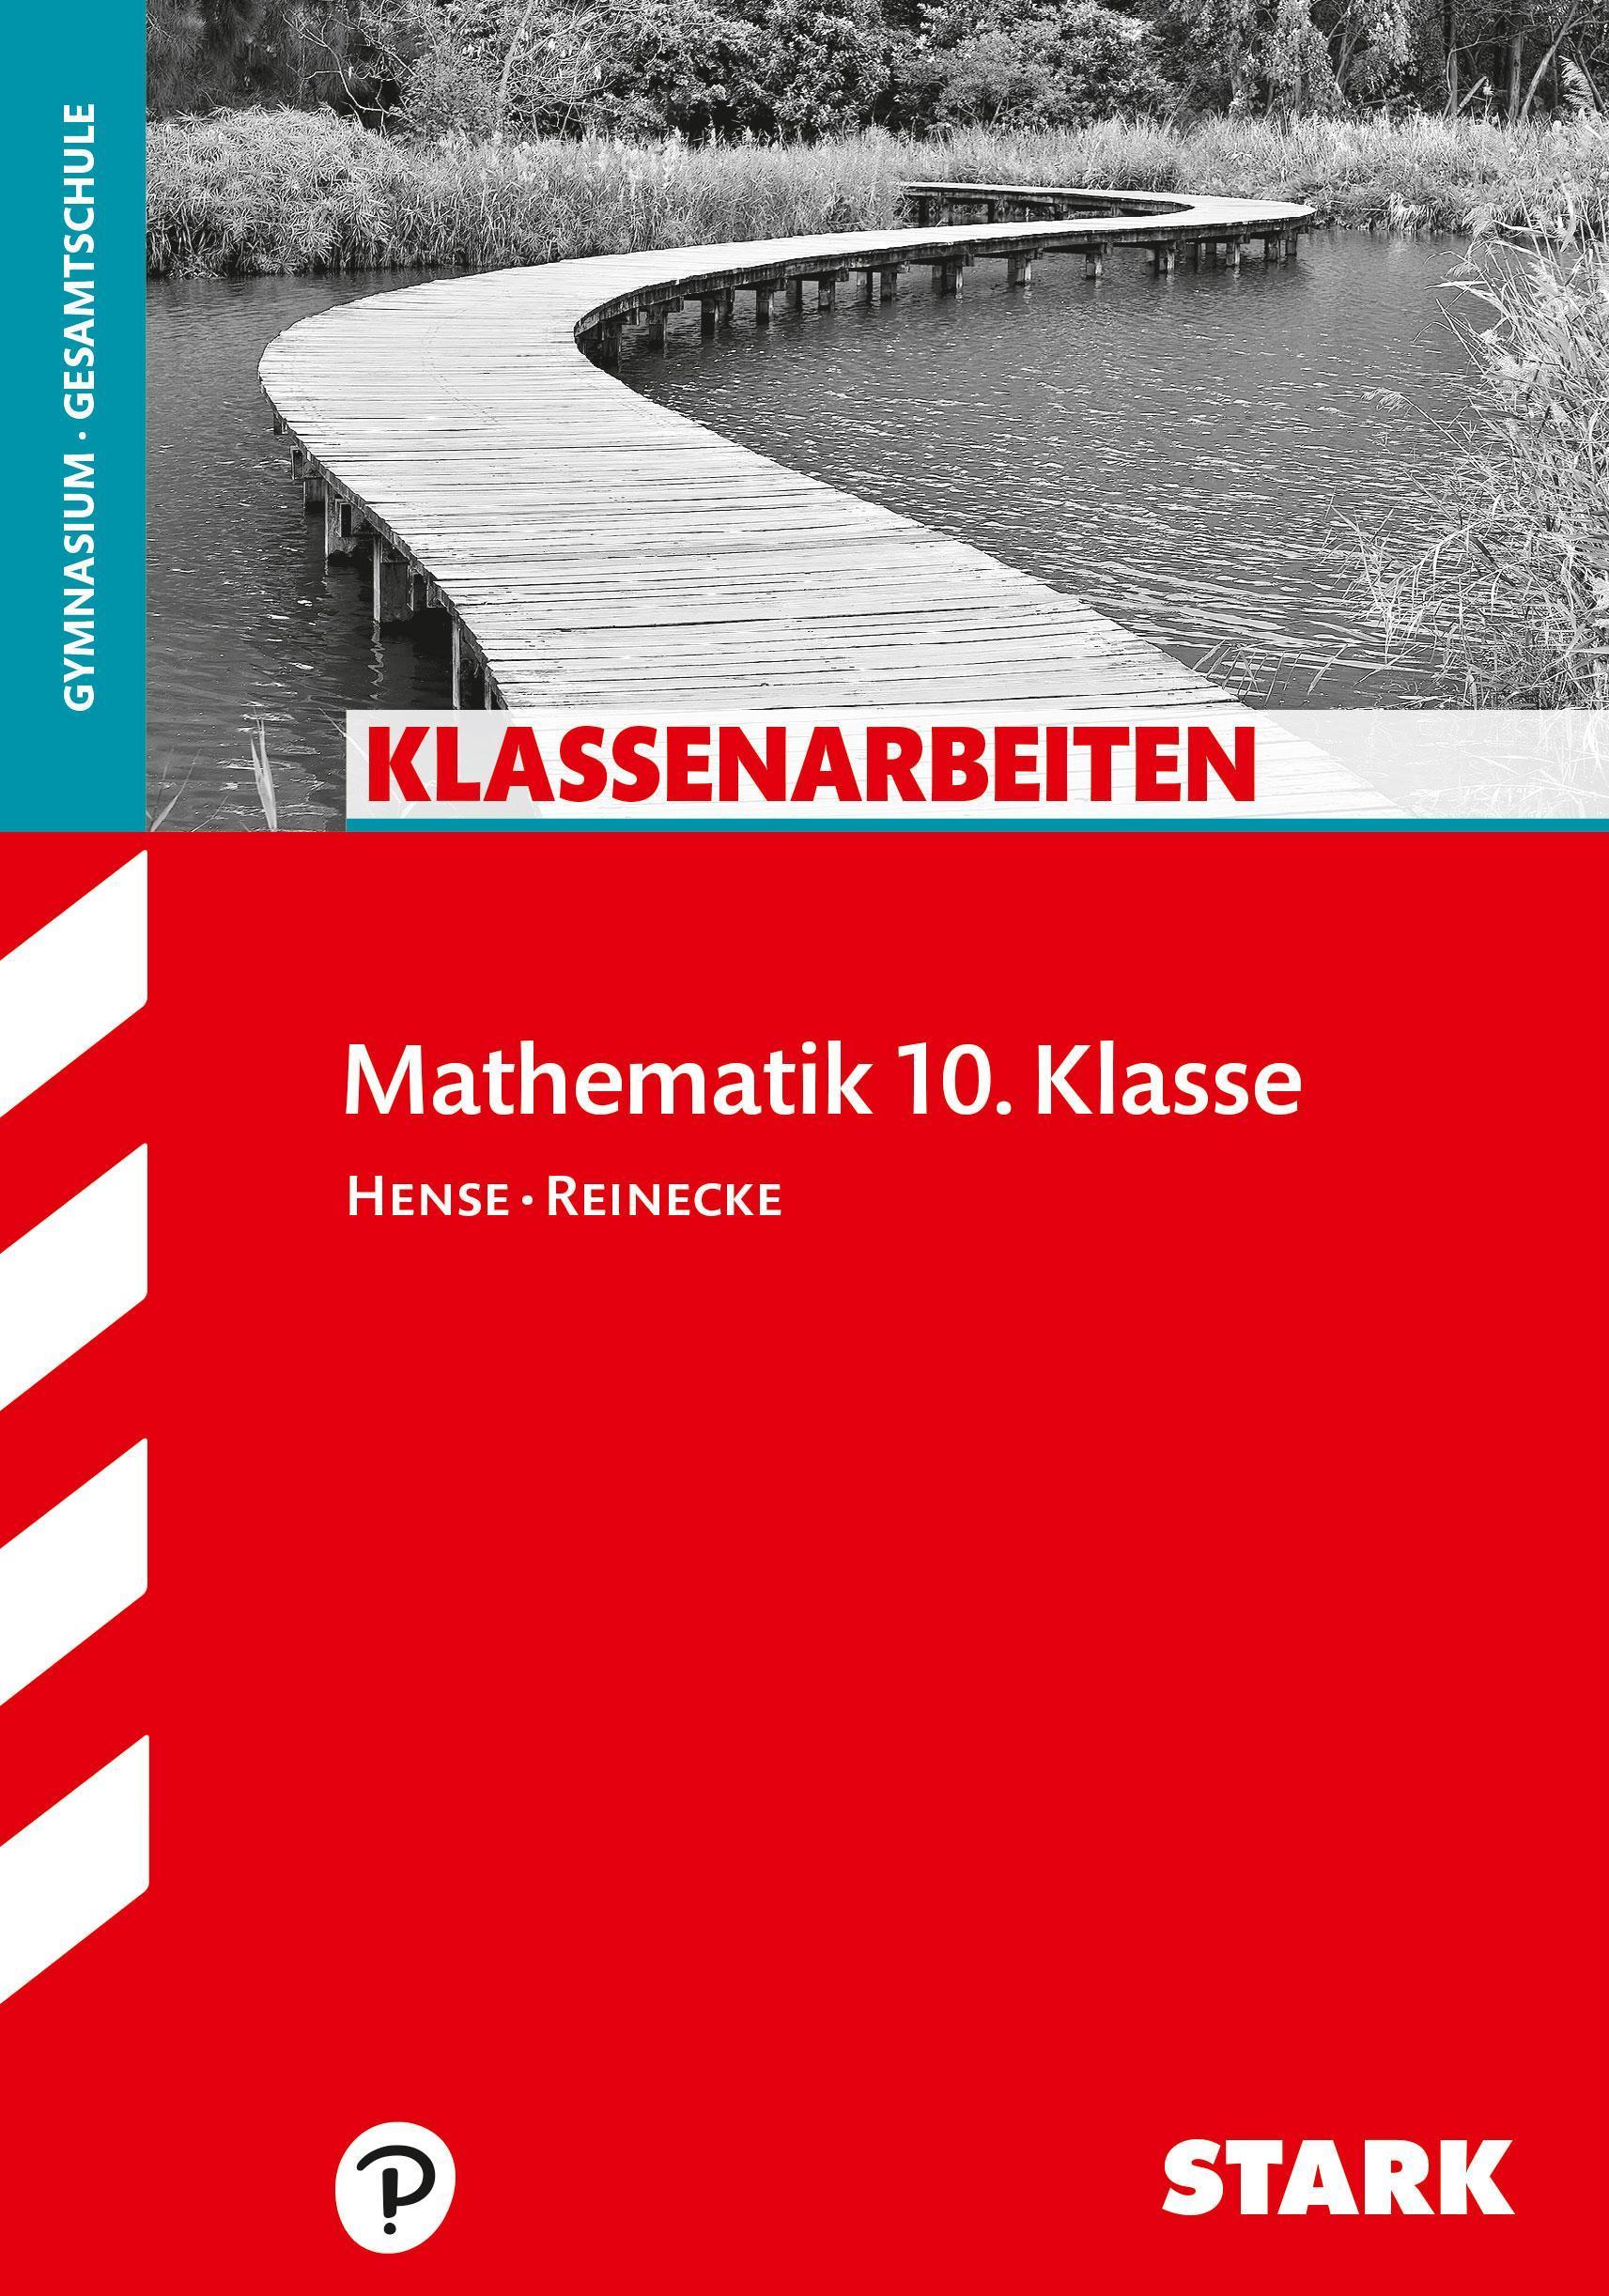 Klassenarbeiten-Gymnasium-Mathematik-10-Klasse-Sebastian-Hense